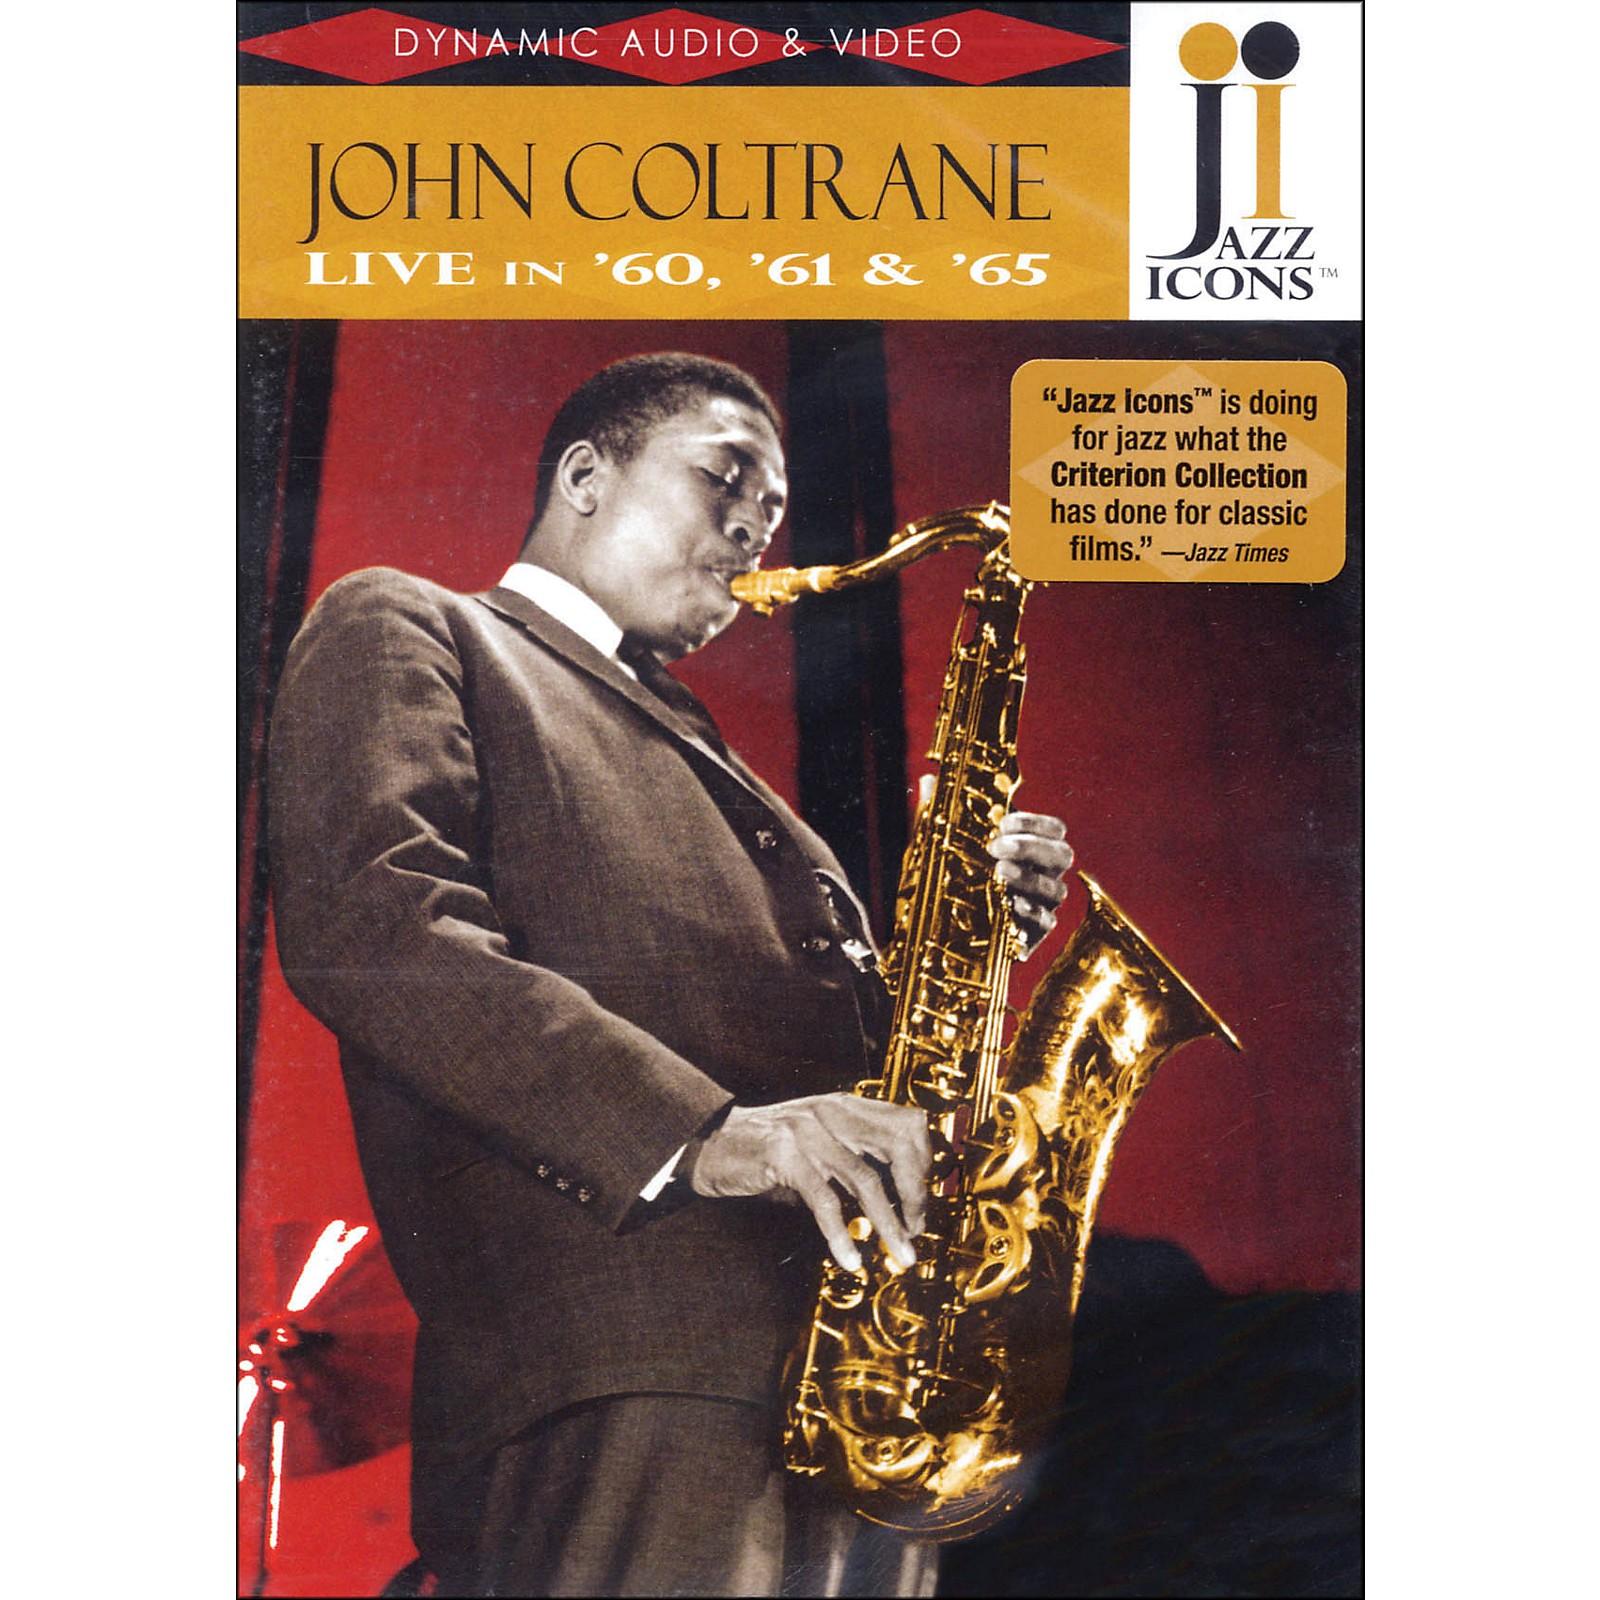 Hal Leonard John Coltrane - Live In '60, '61 And '65 - Jazz Icons DVD